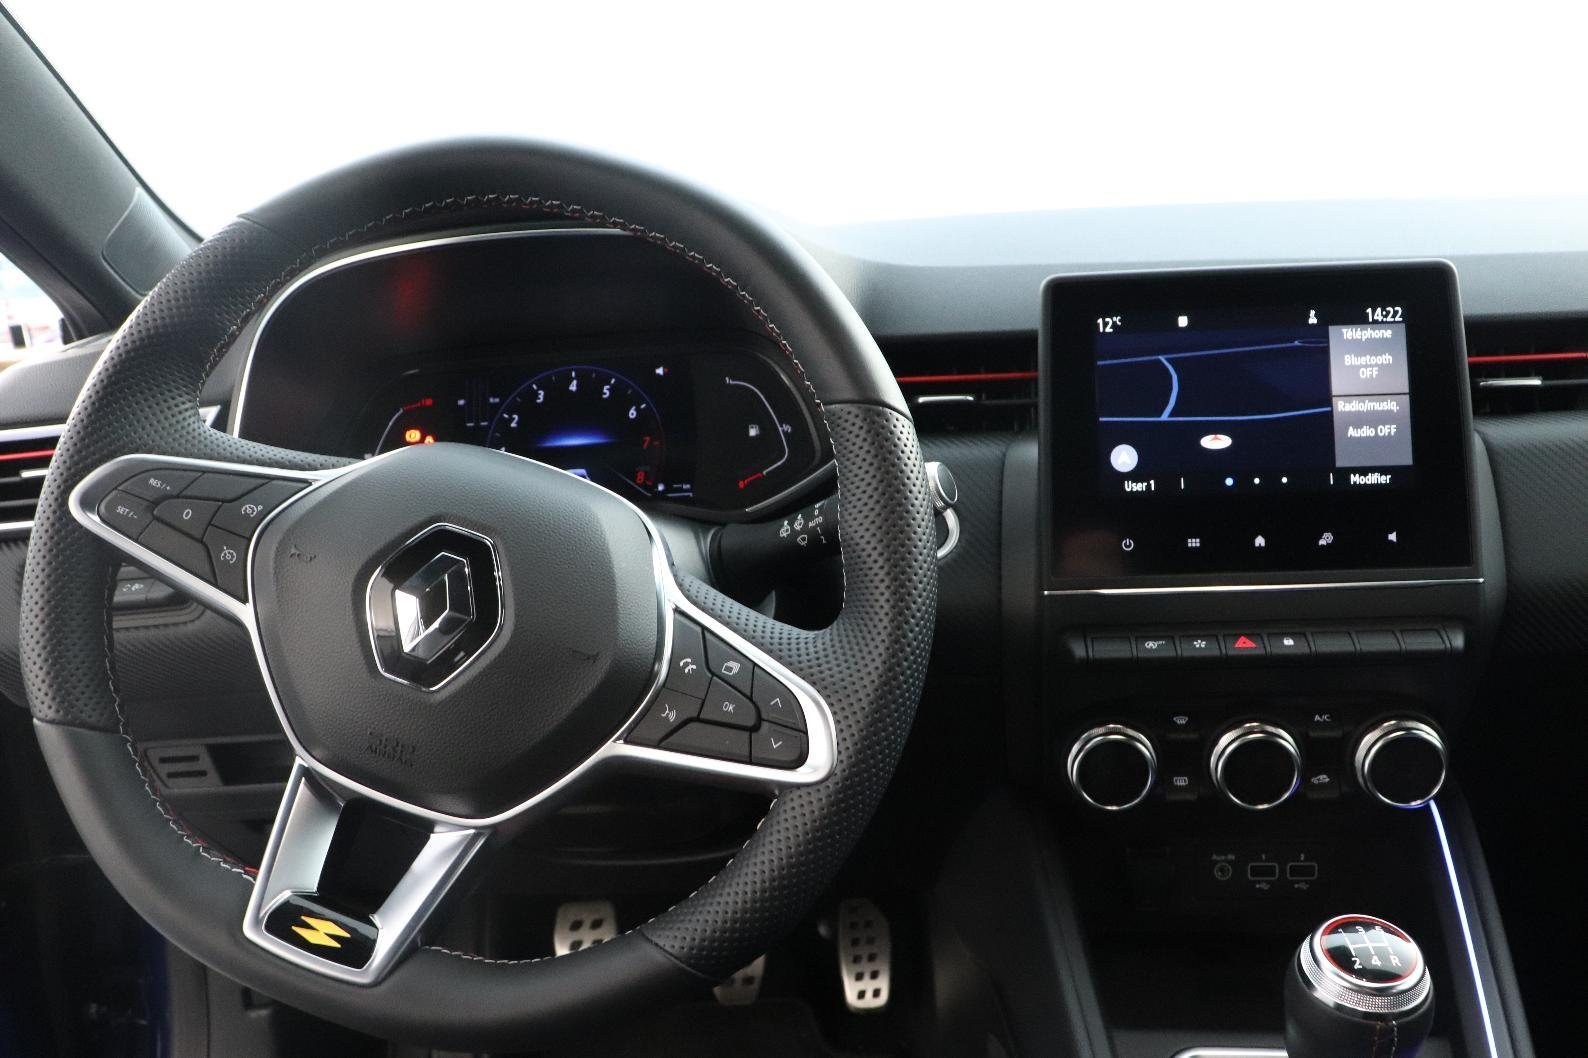 RENAULT CLIO V Clio TCe 100 RS Line